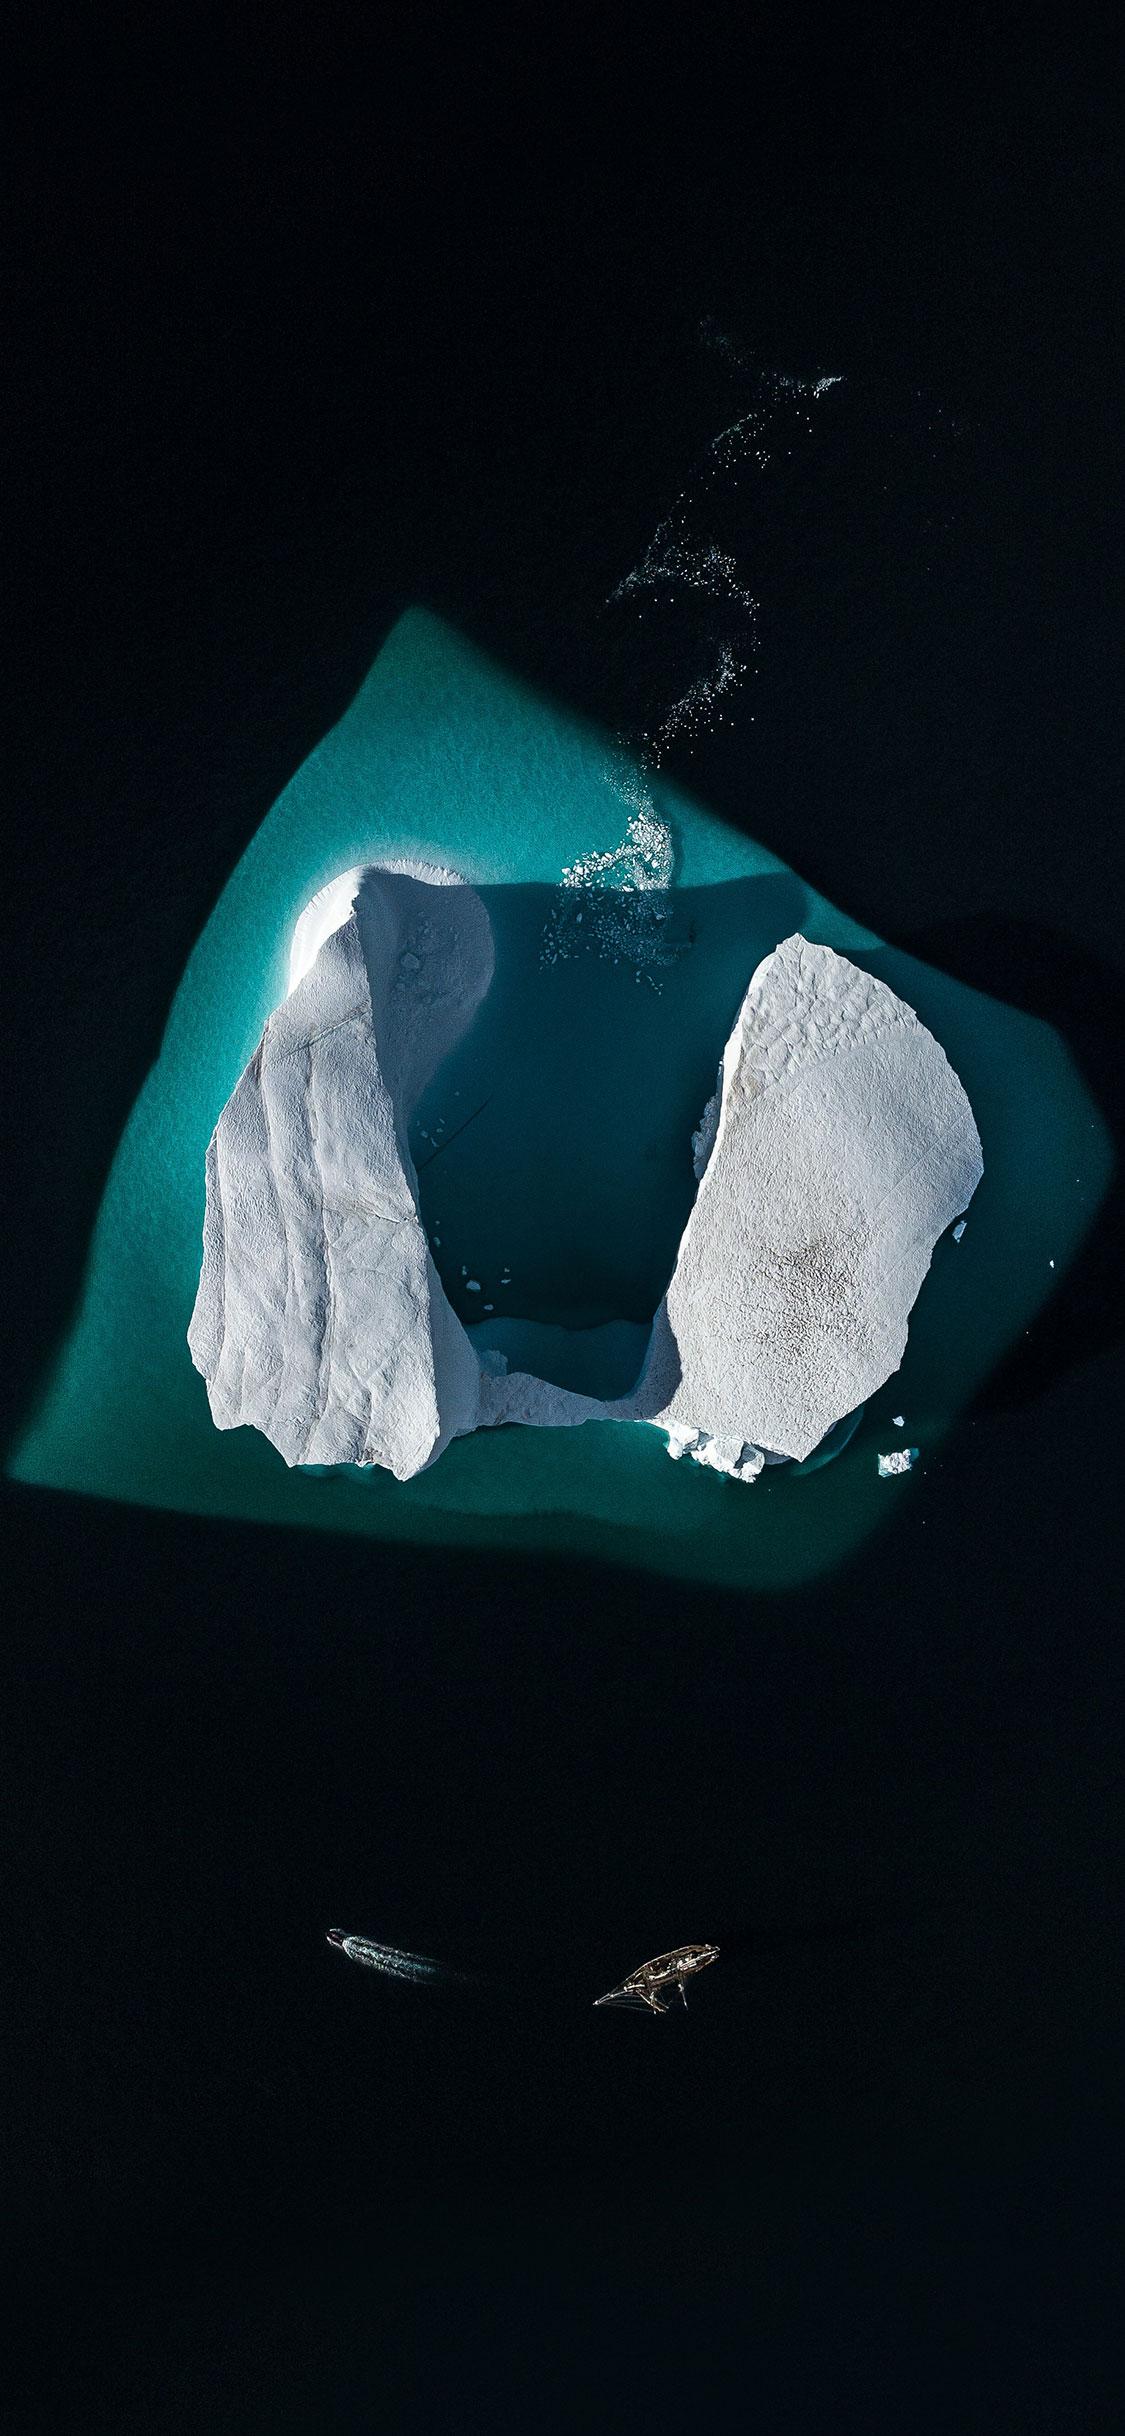 iPhone wallpaper iceberg black Iceberg